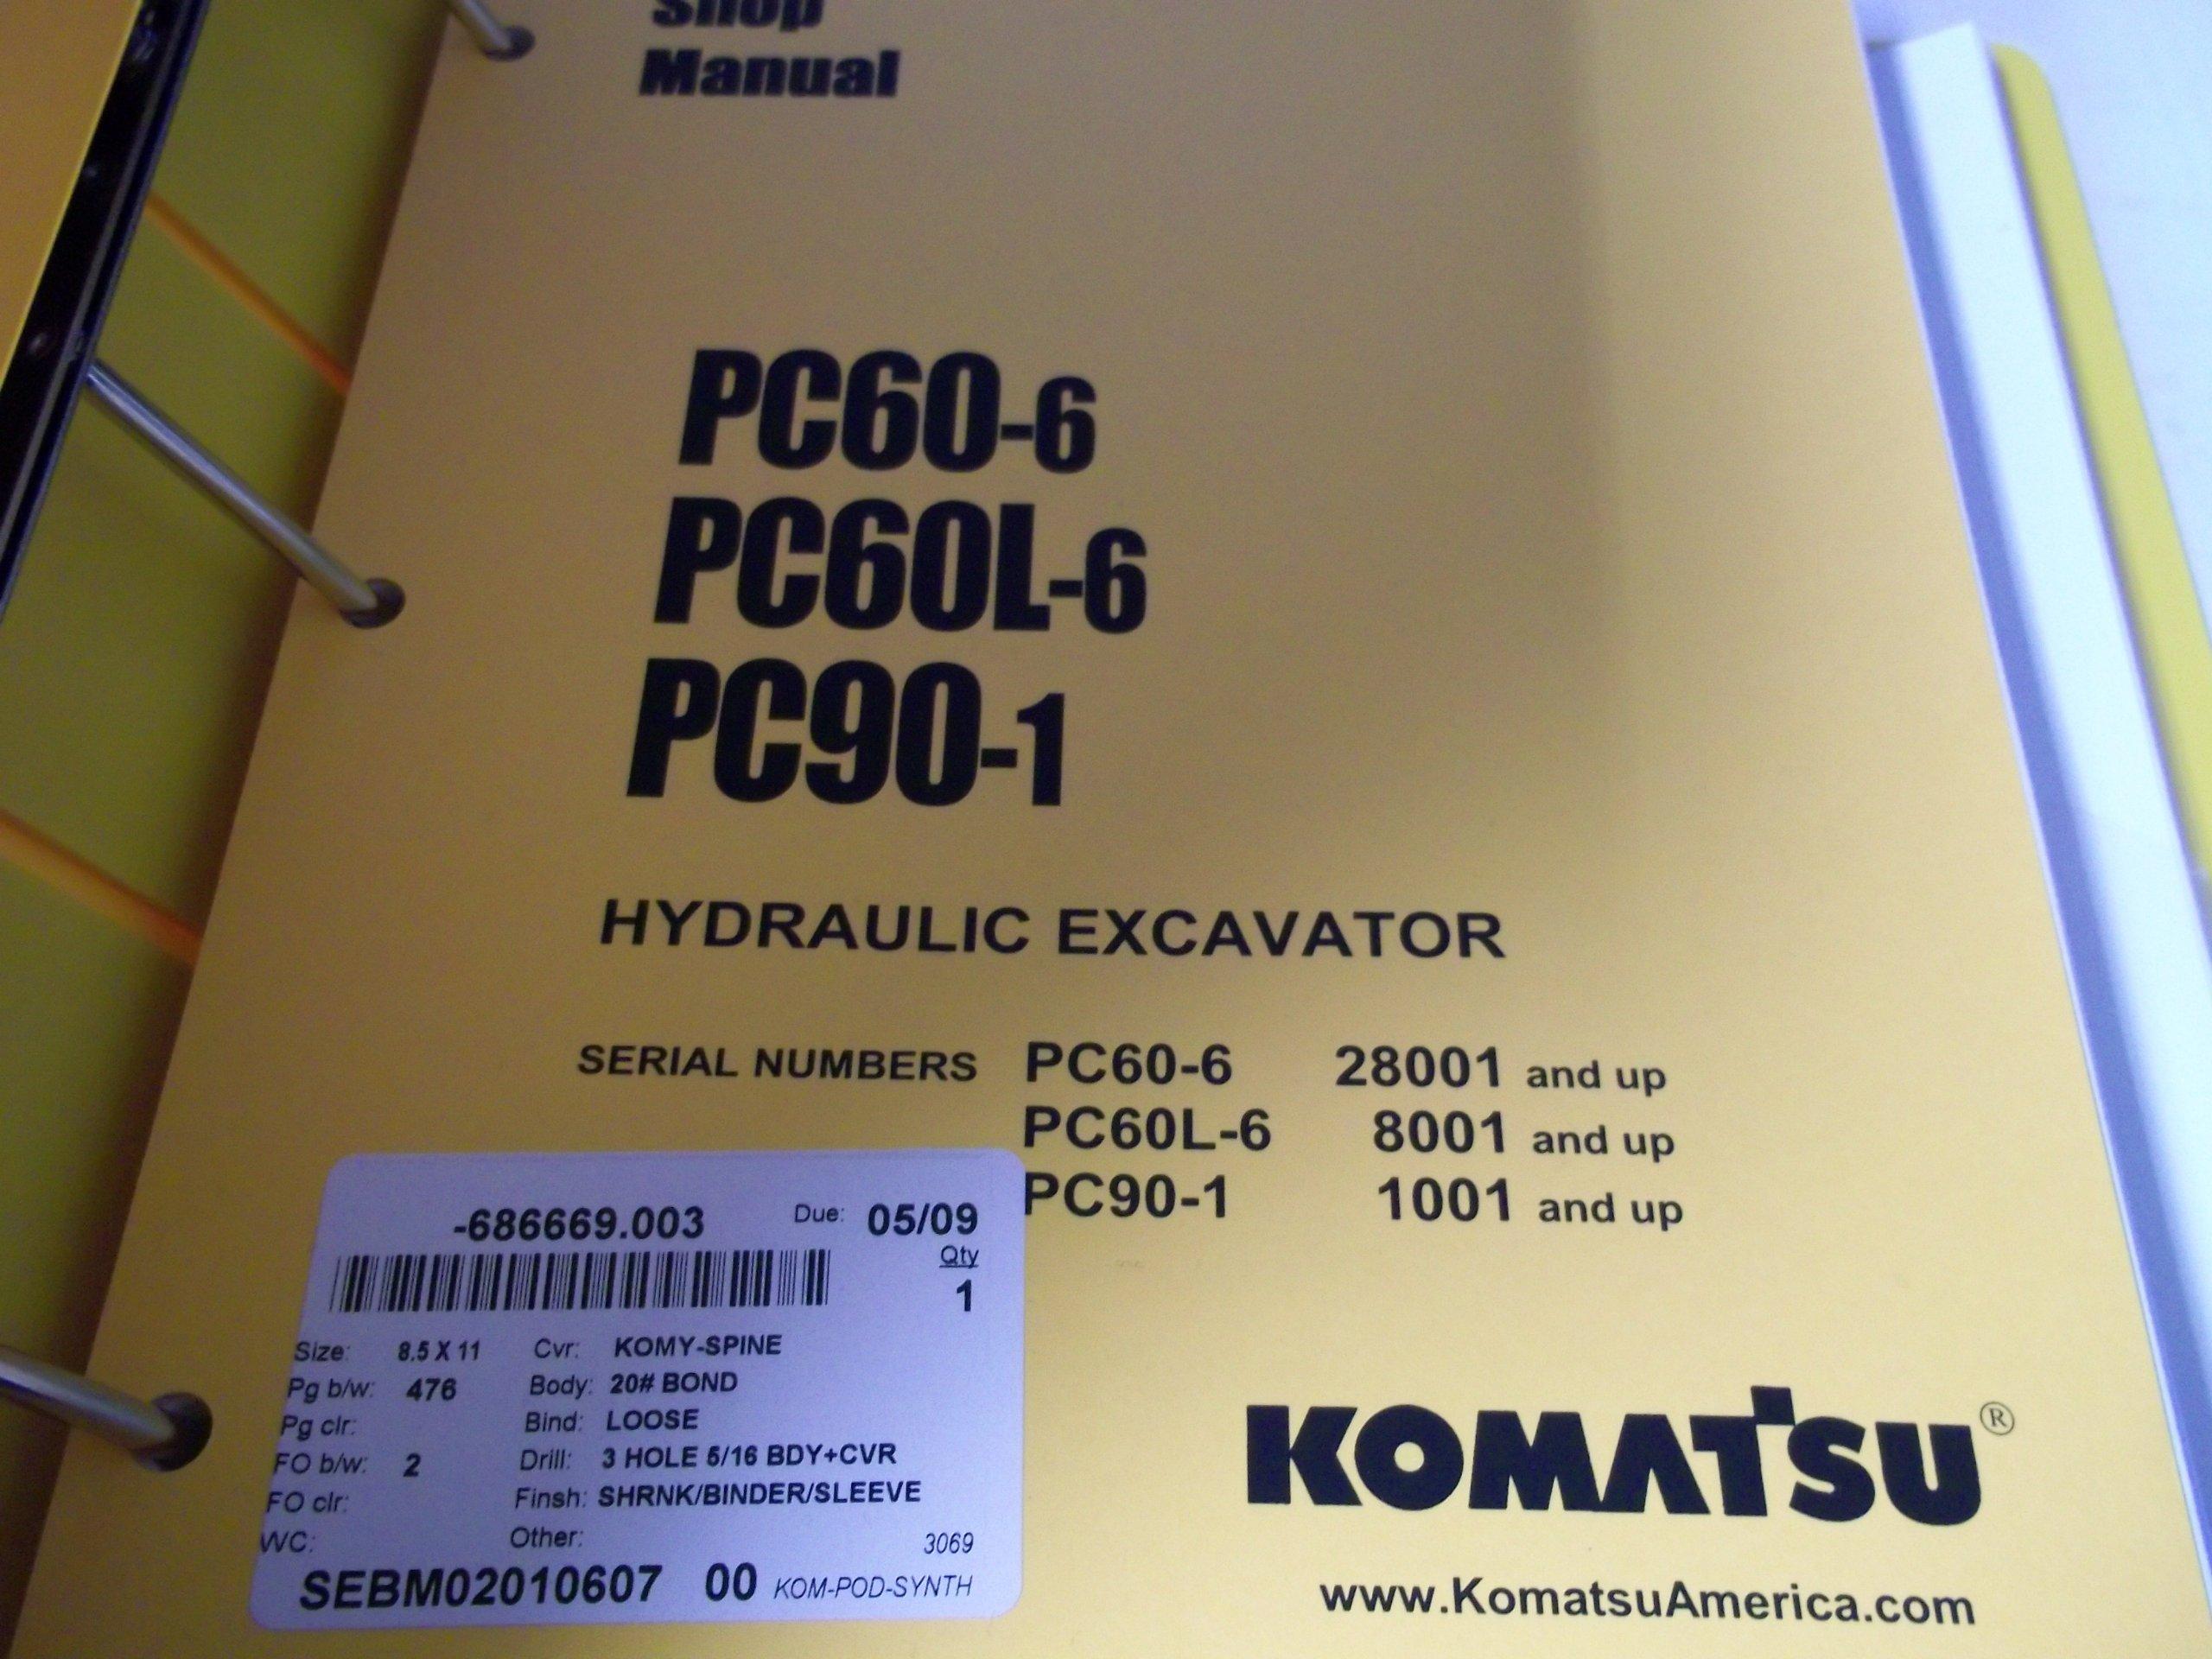 Komatsu PC60-6, PC60L-6, PC90-1 Hydraulic Excavator Service Manual